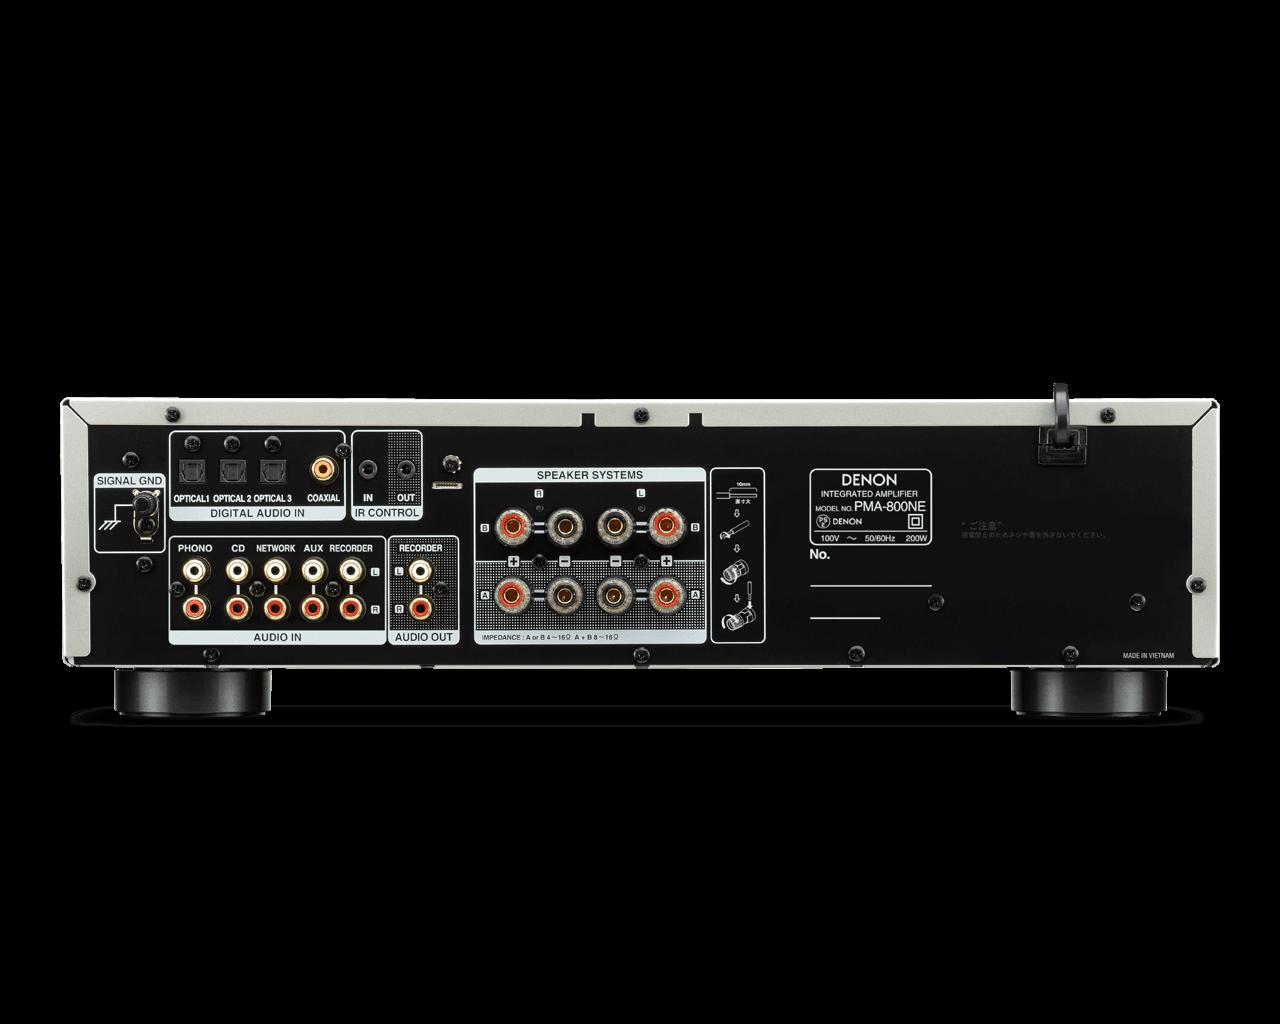 PMA 800NE rear compressor - 【DENON PMA-800NE】価格を超えたエントリークラスのおすすめアンプ【10万円以下】